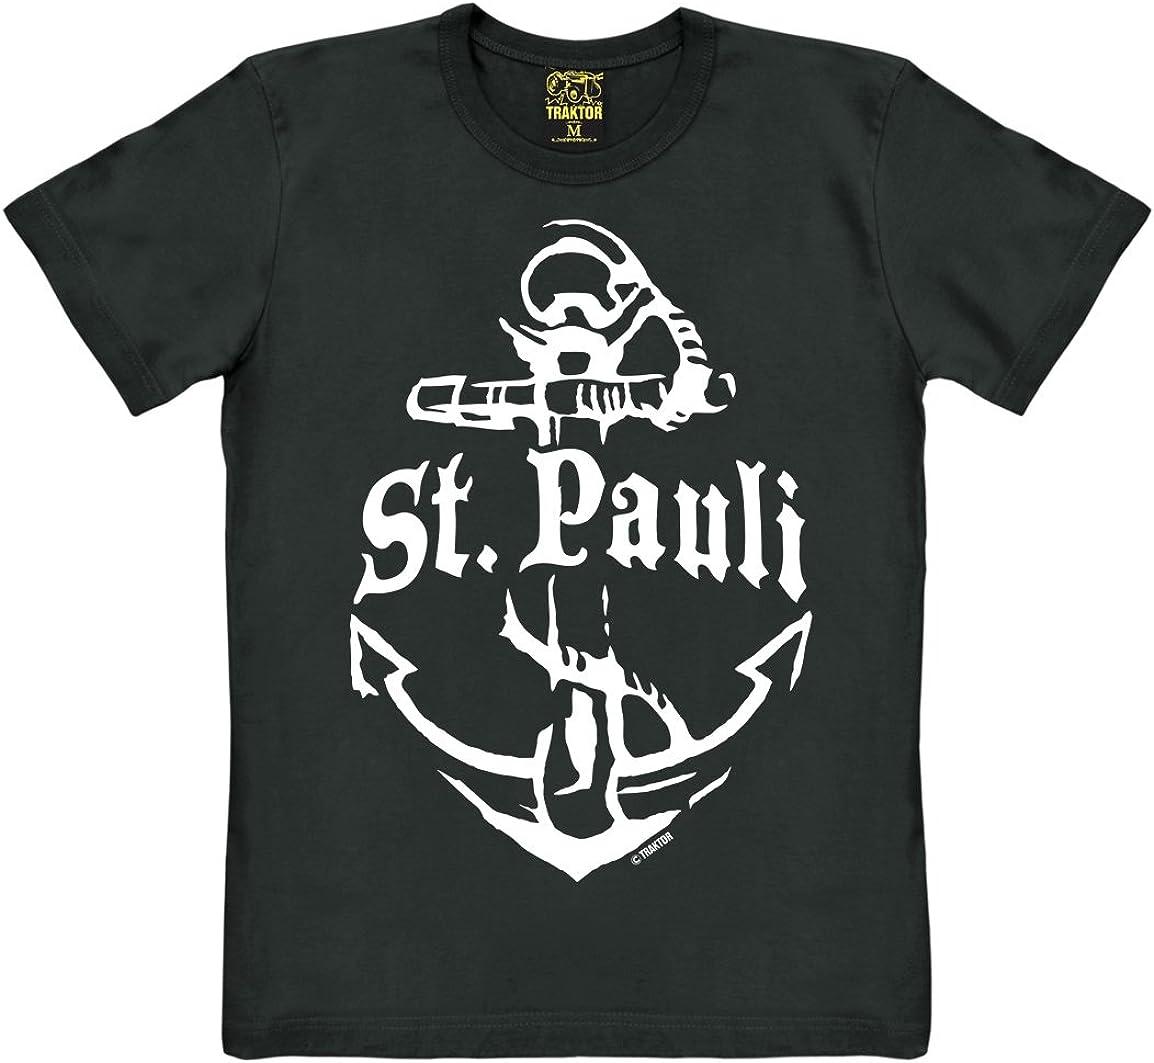 TRAKTOR Camiseta St. Pauli - Sankt Pauli - Hamburgo - Camiseta ...